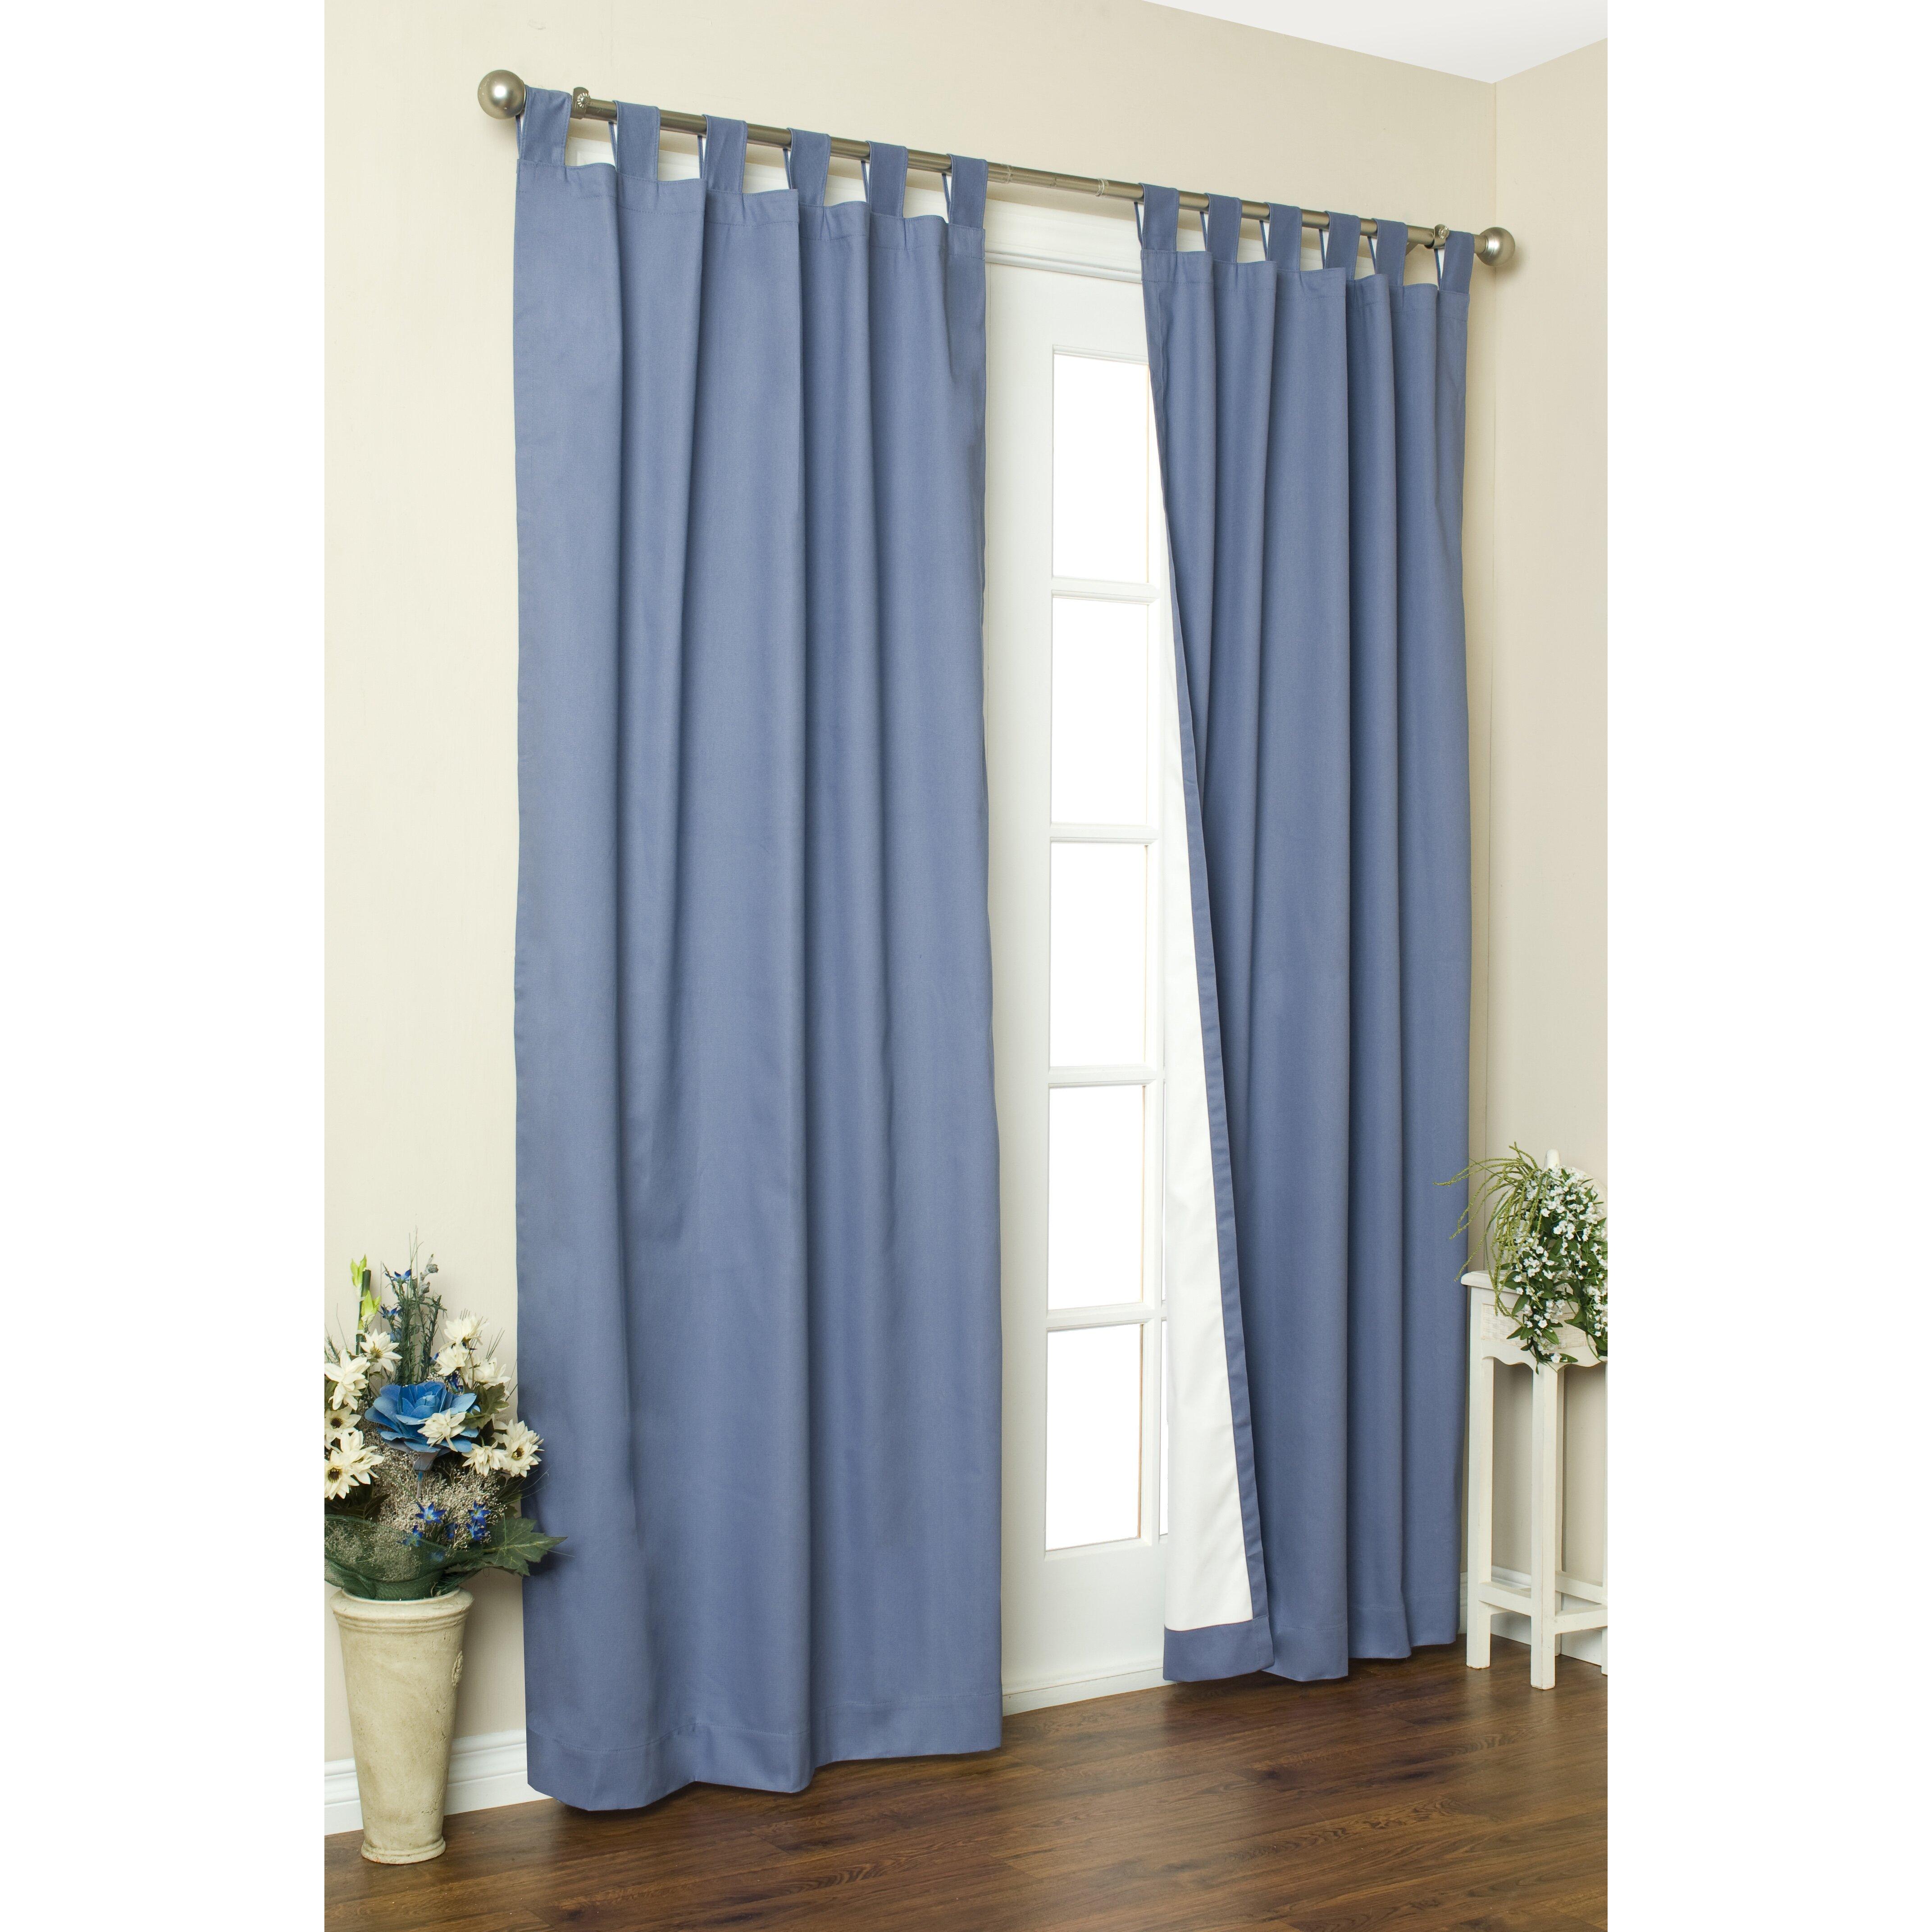 Alcott Hill Ranger Thermal Tab Top Curtain Panels